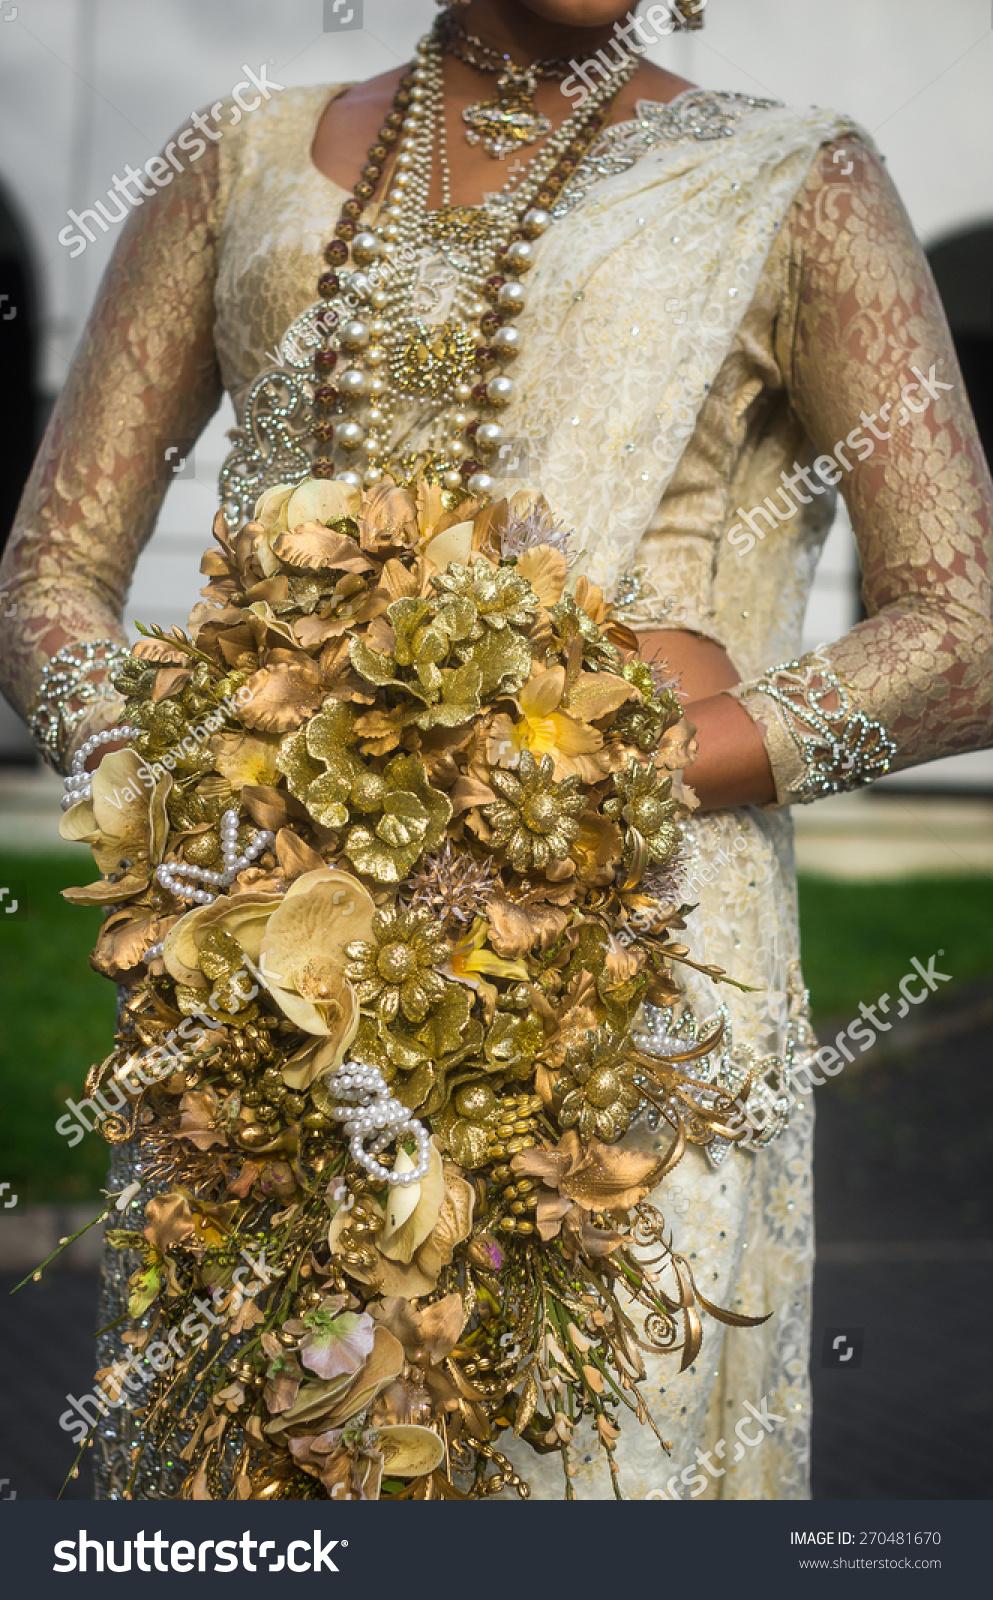 Sri lankan bride wedding bouquet stock photo edit now 270481670 sri lankan bride with a wedding bouquet izmirmasajfo